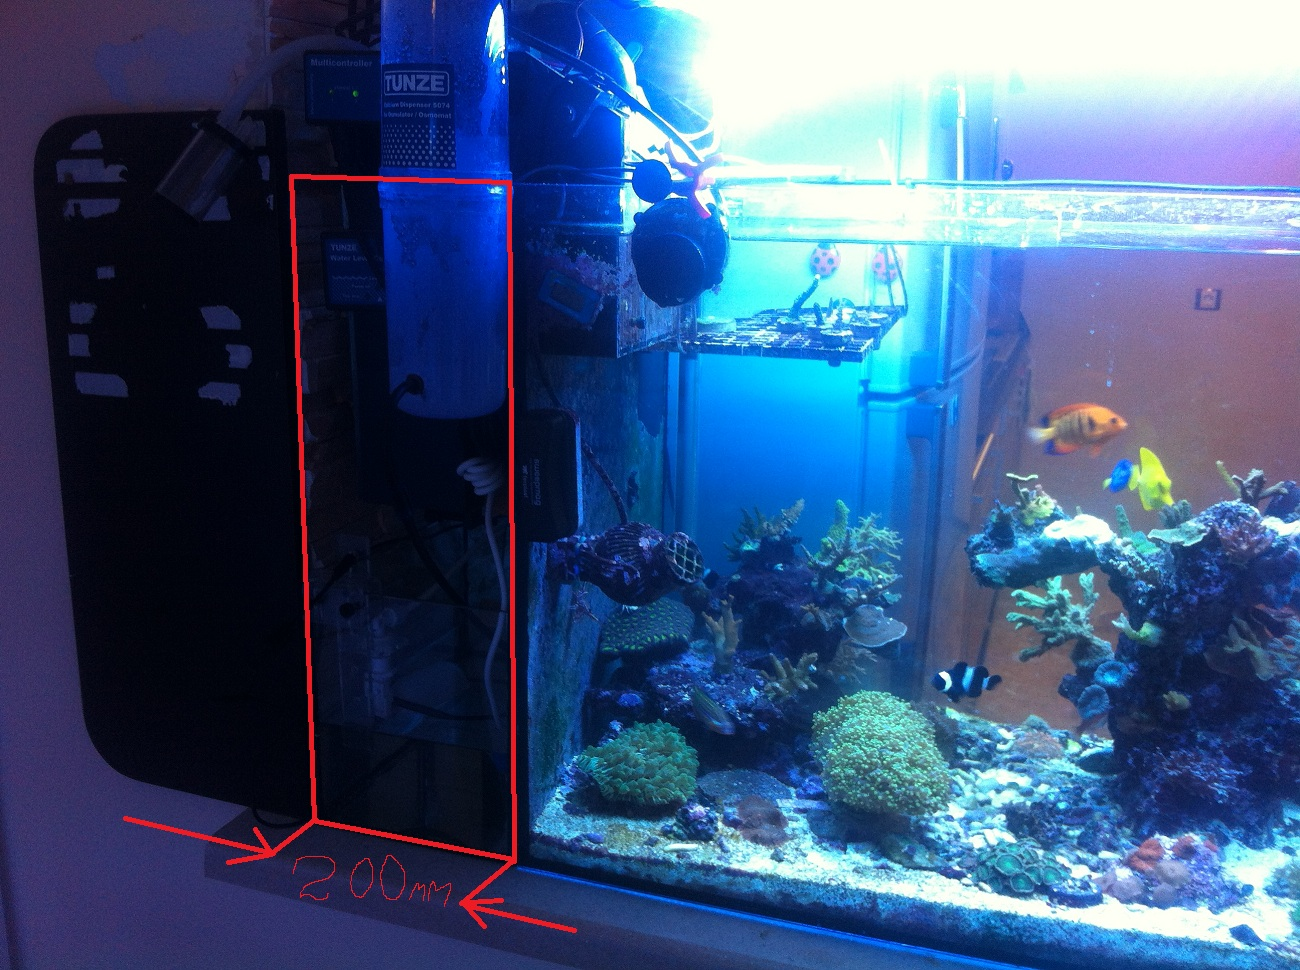 Пристрой к аквариуму САМПа - Планирую морской аквариум - ReefCentral.ru - Форум. Морская аквариумистика.